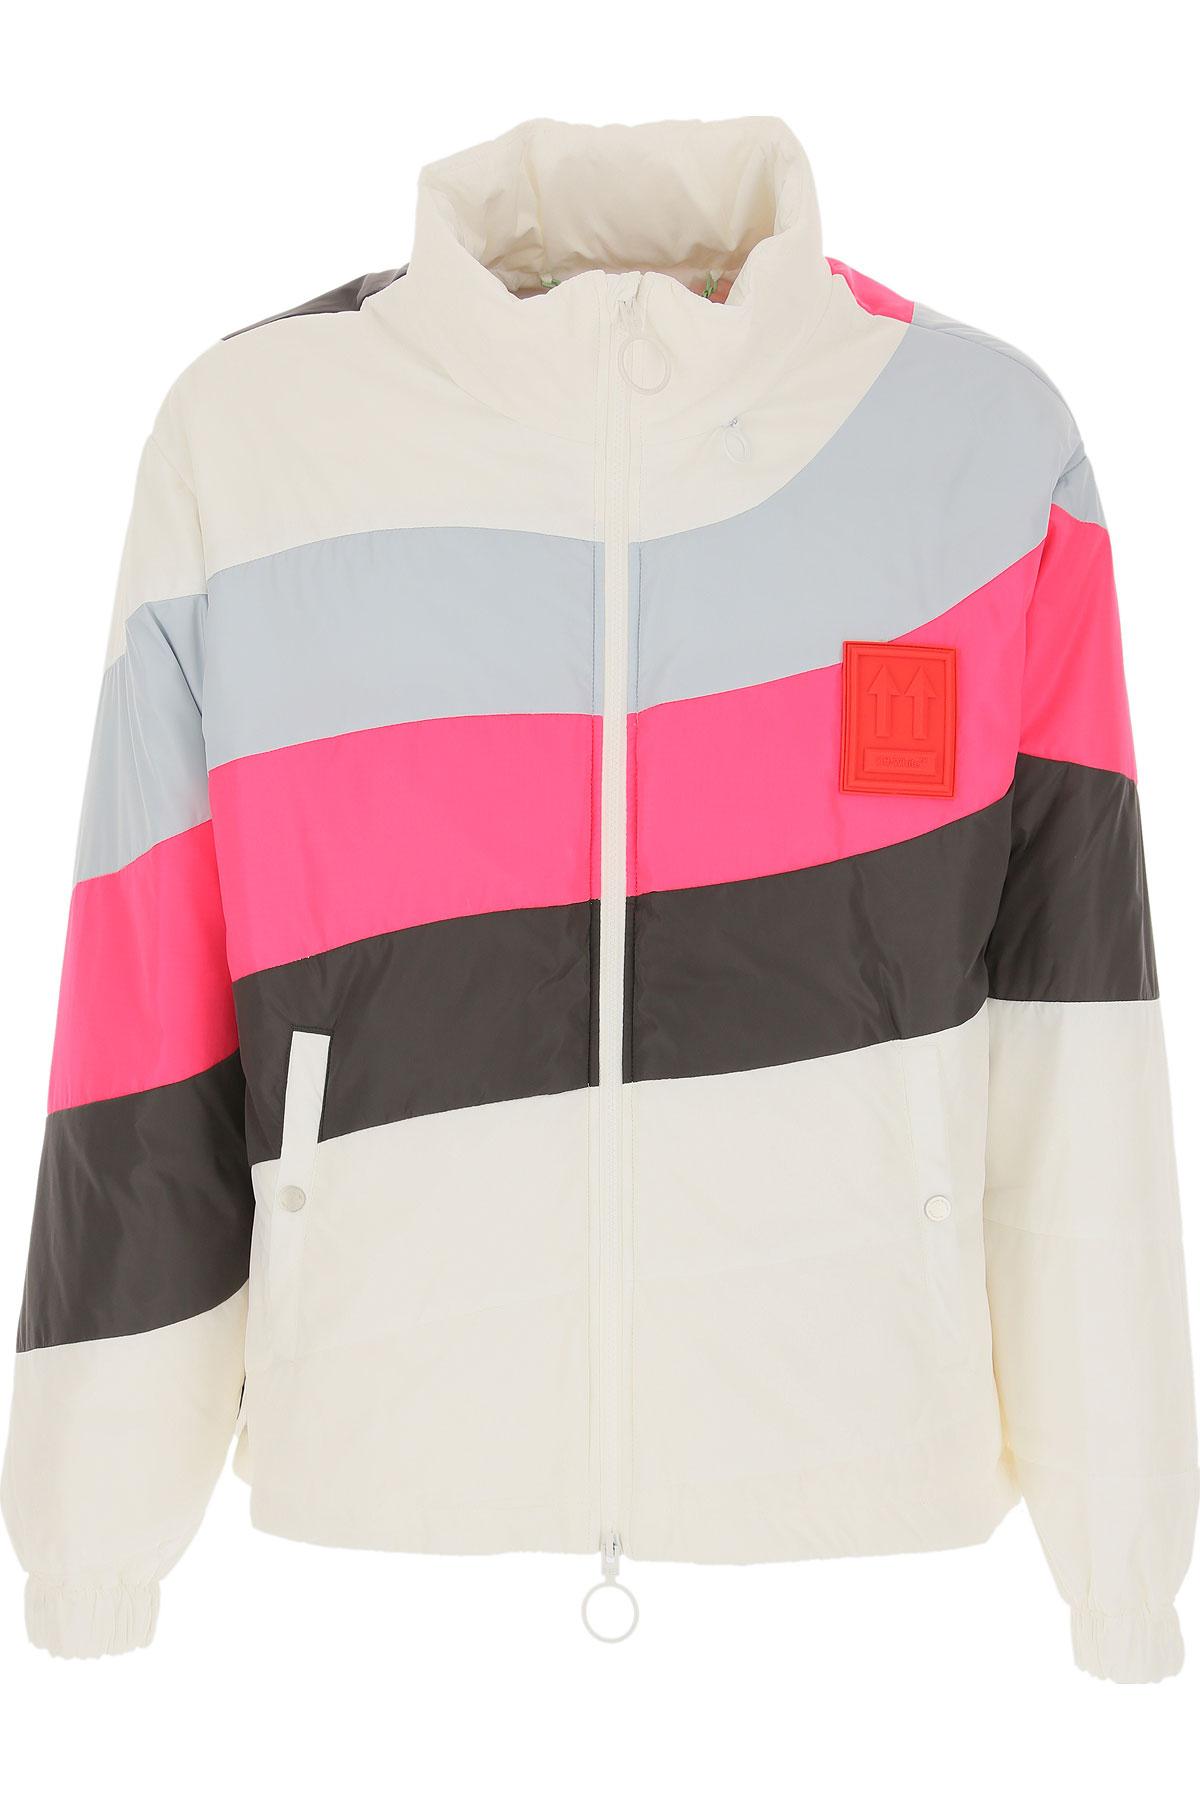 Off-White Virgil Abloh Down Jacket for Men, Puffer Ski Jacket On Sale, White, Down, 2019, L M S XL